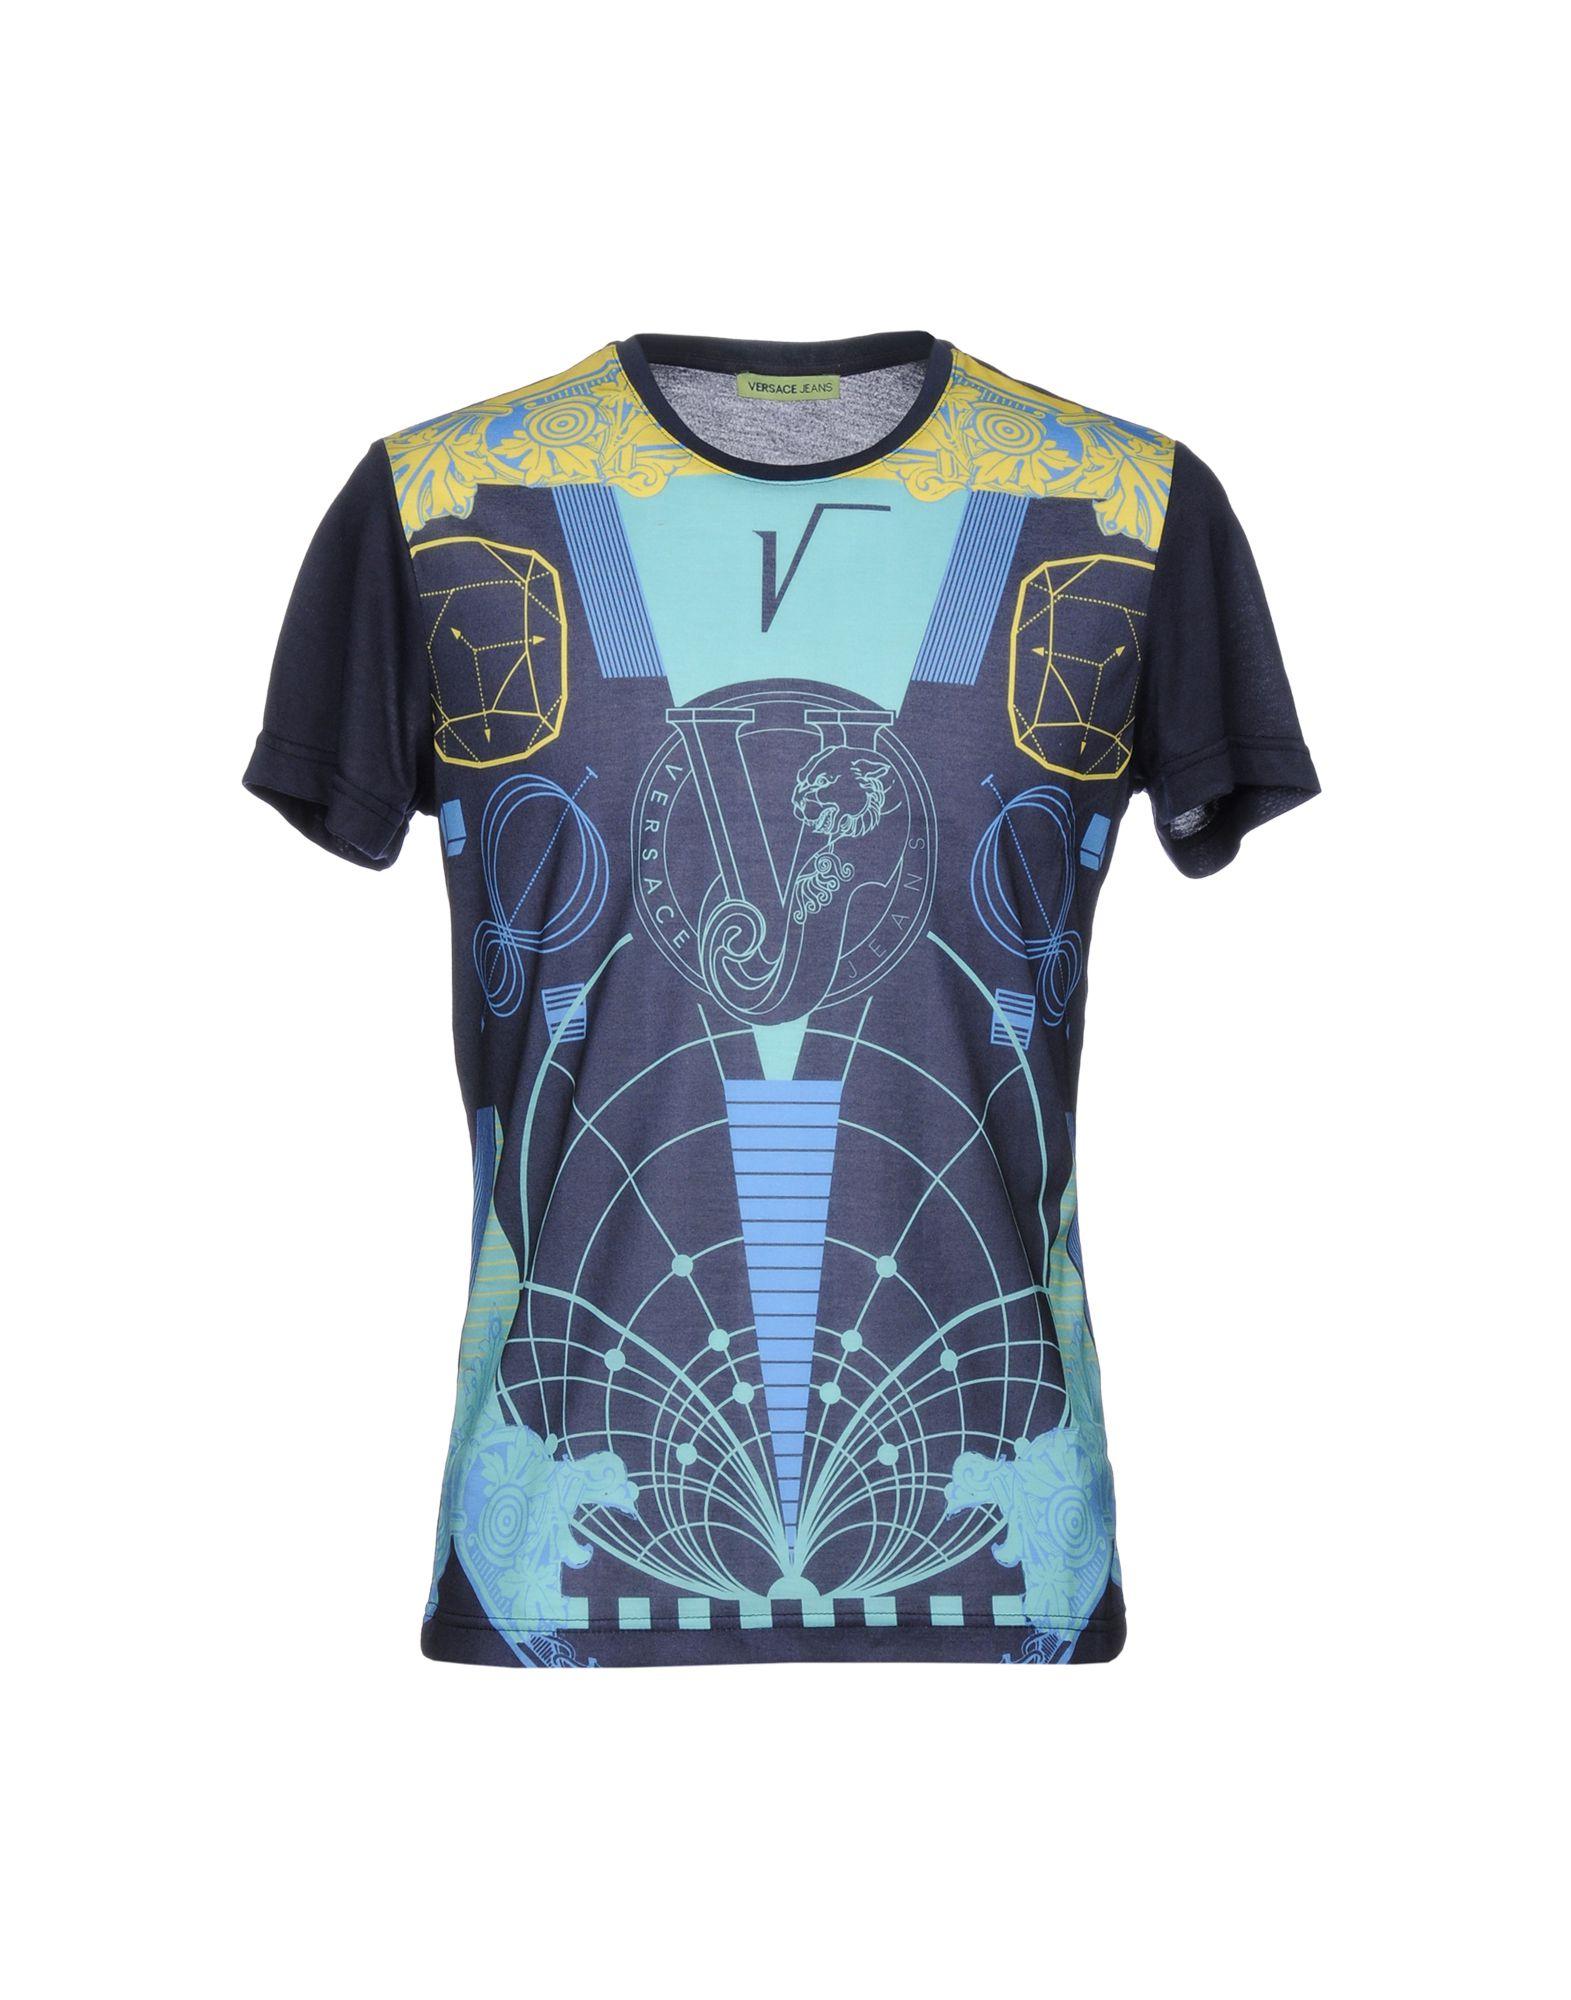 VERSACE JEANS Футболка футболка versace разноцветный